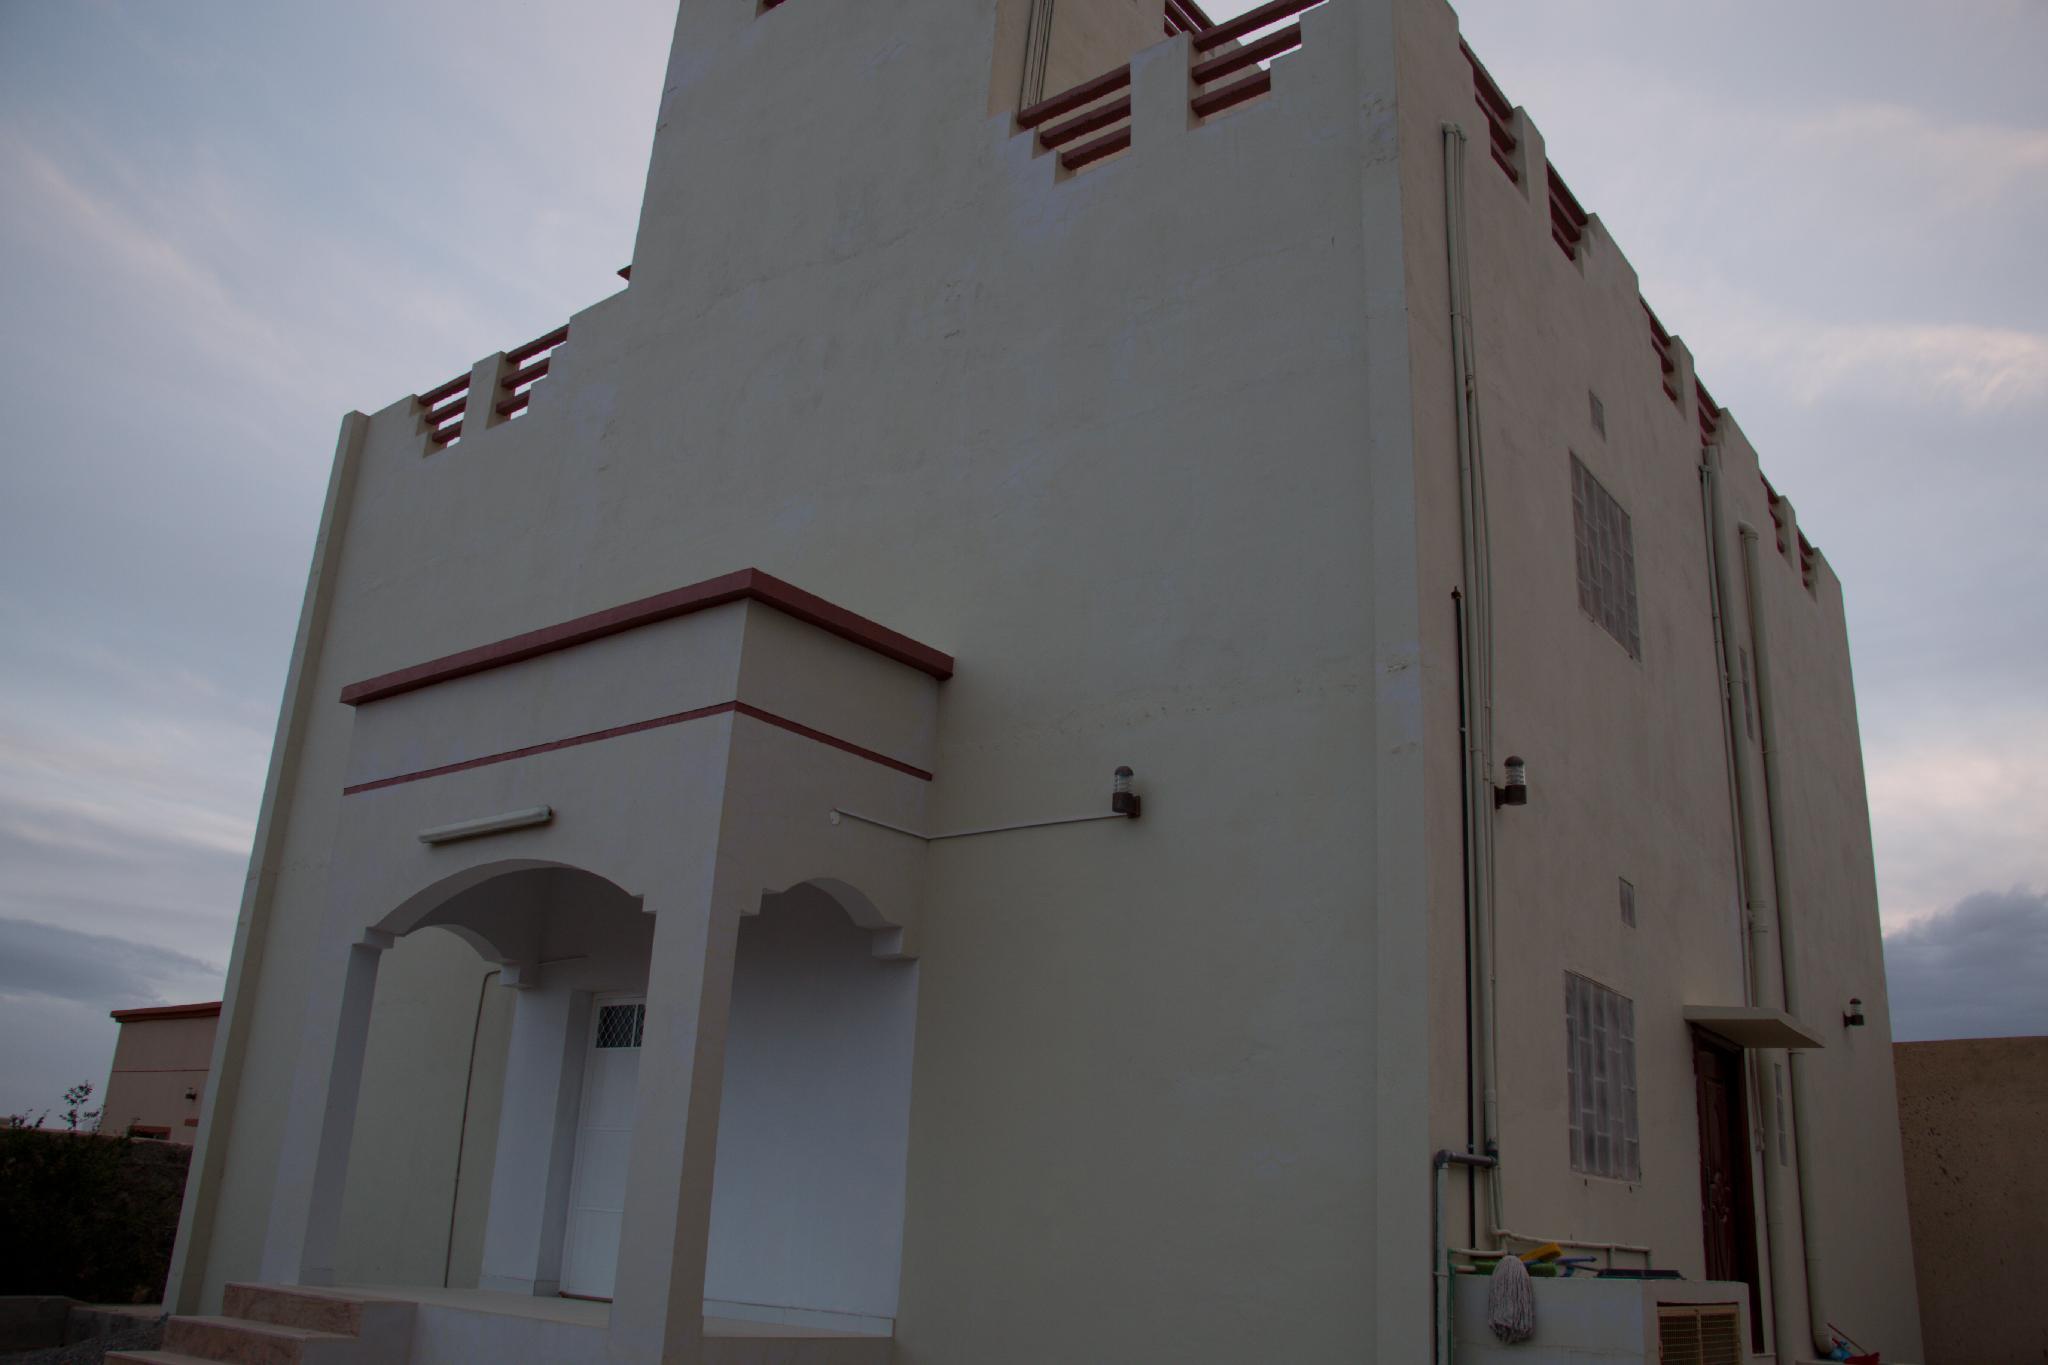 Aljabal Al'akhdar House